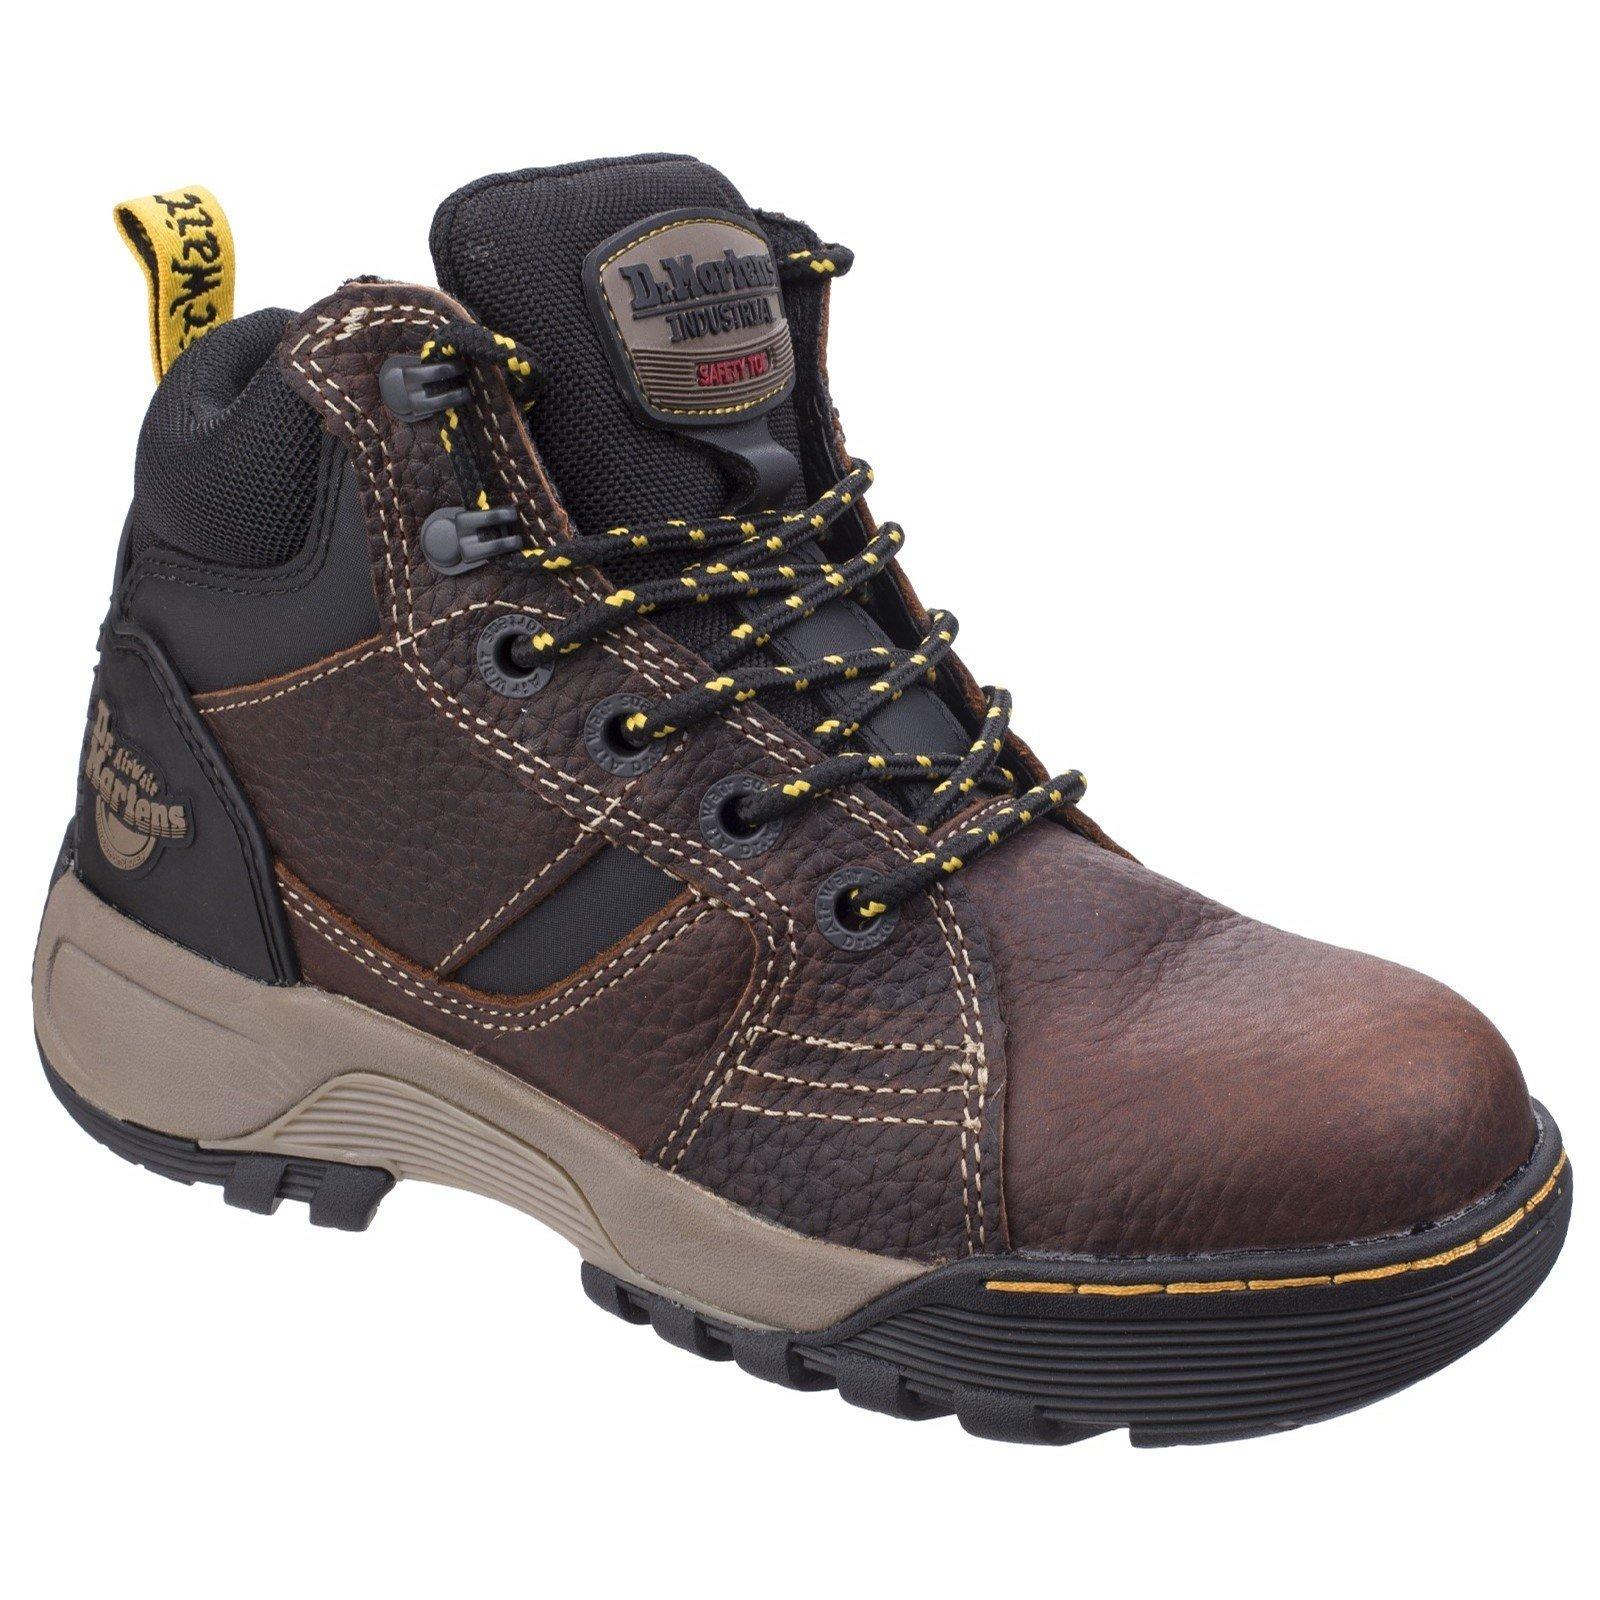 Dr Martens Men's Grapple Safety Boot Various Colours 26023 - Teak 10